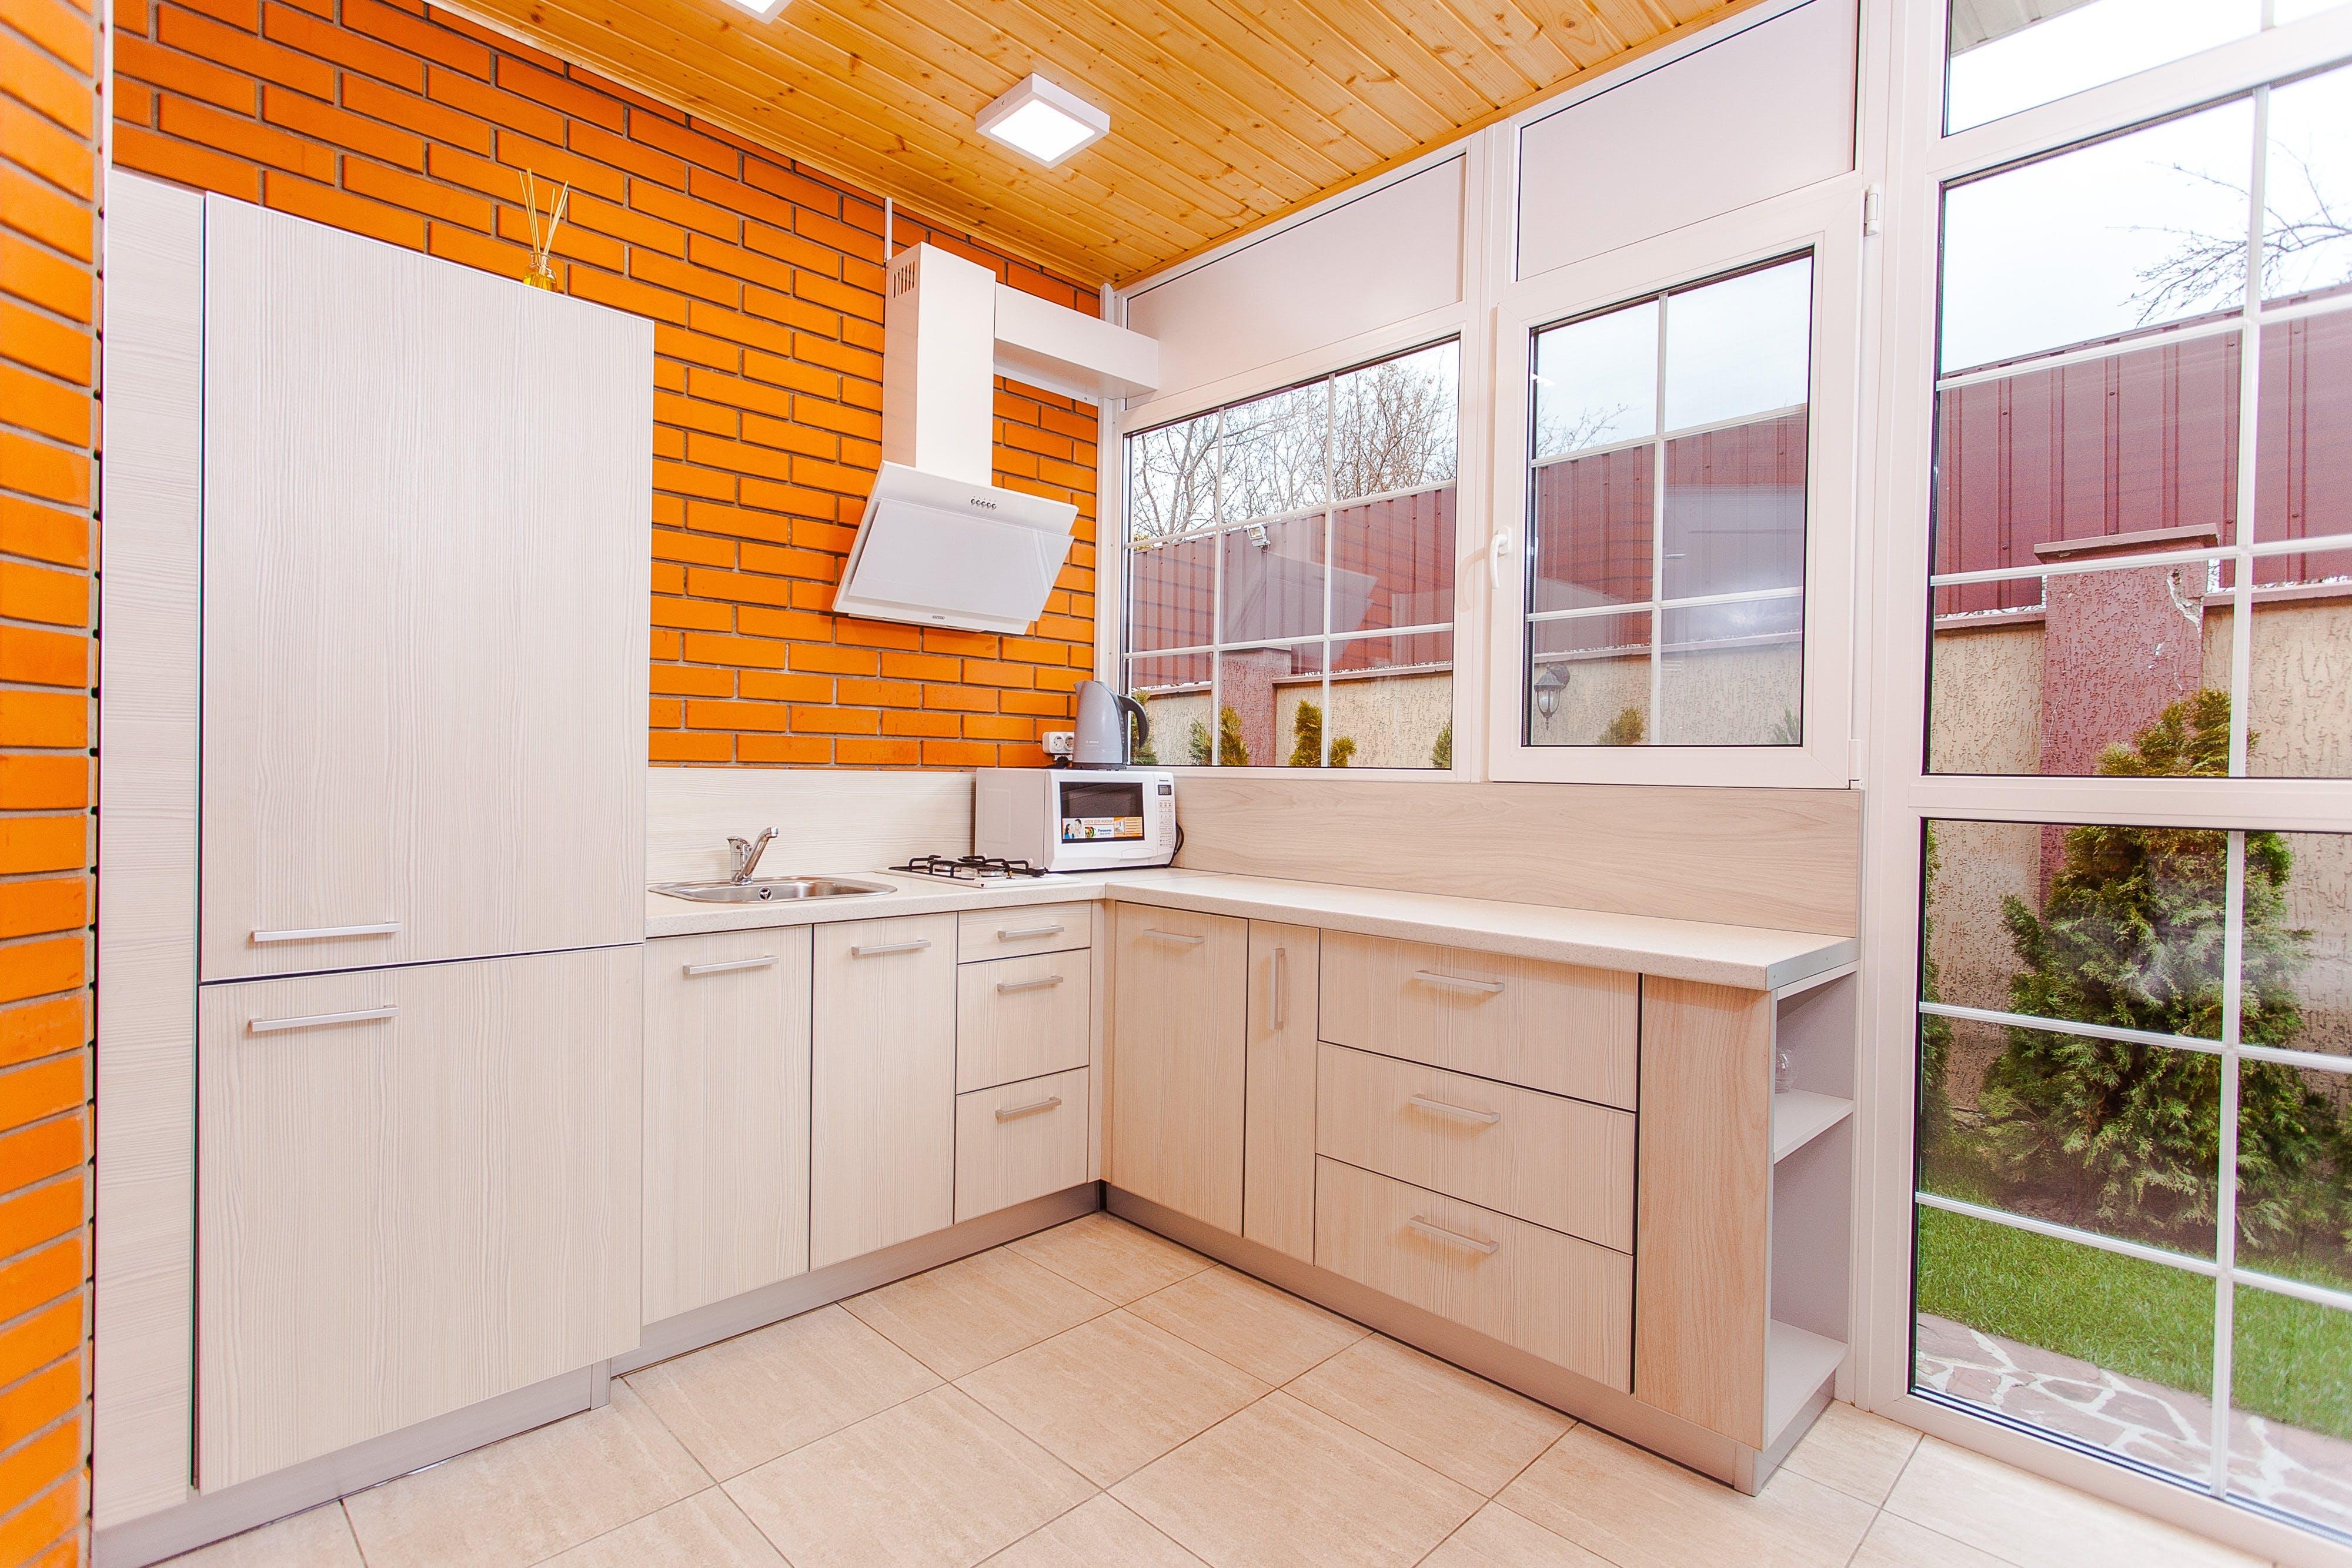 architecture, brick wall, cabinets